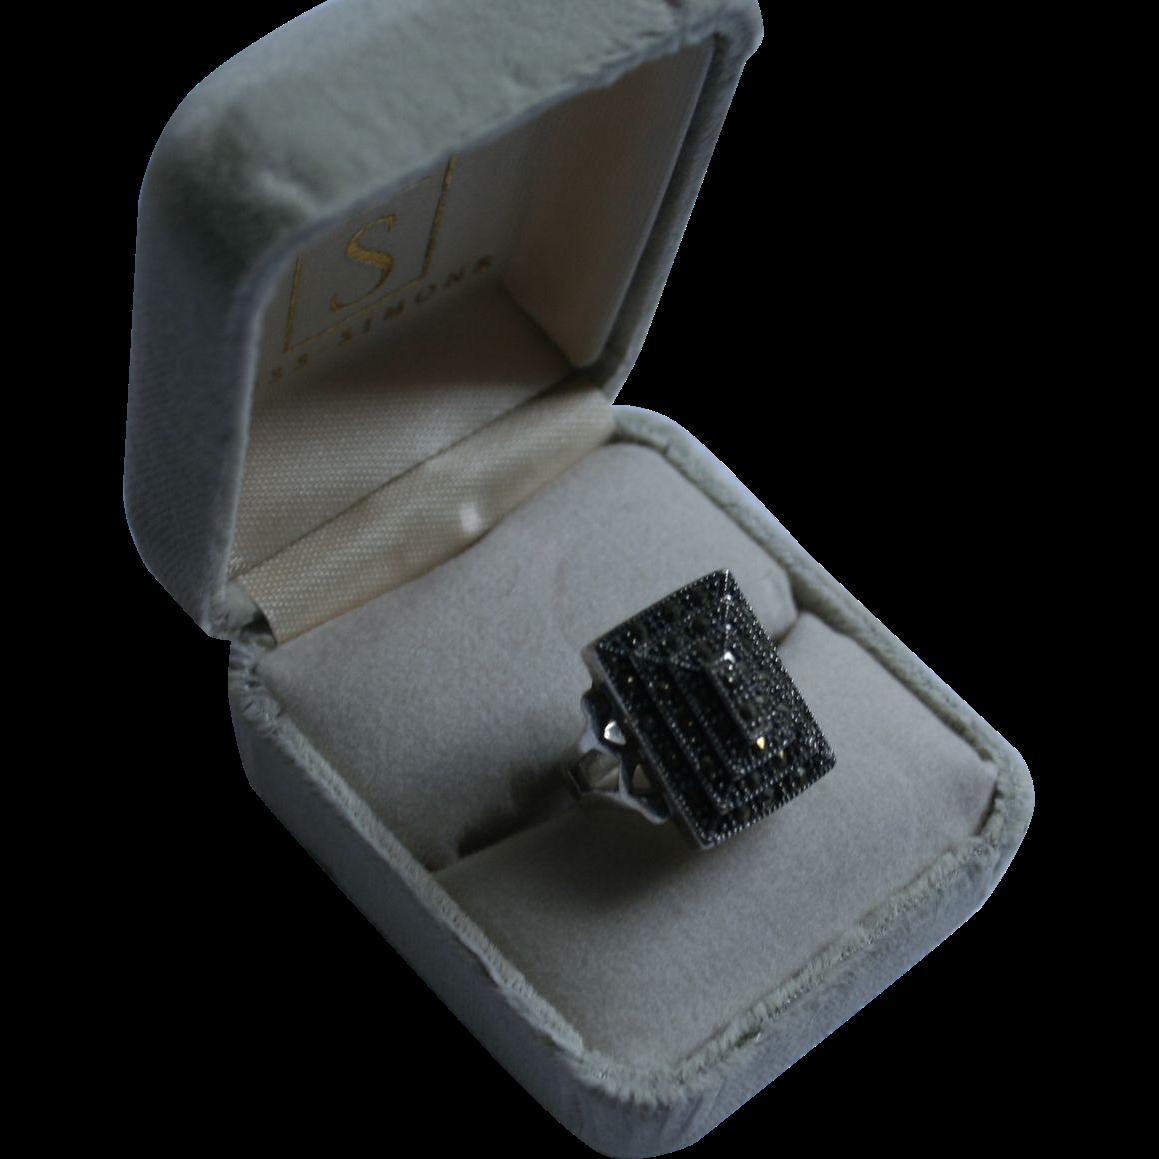 Sterling Silver Stacked Marcasite Rectangular Ring 925 Size 6 Random Harvest Ruby Lane